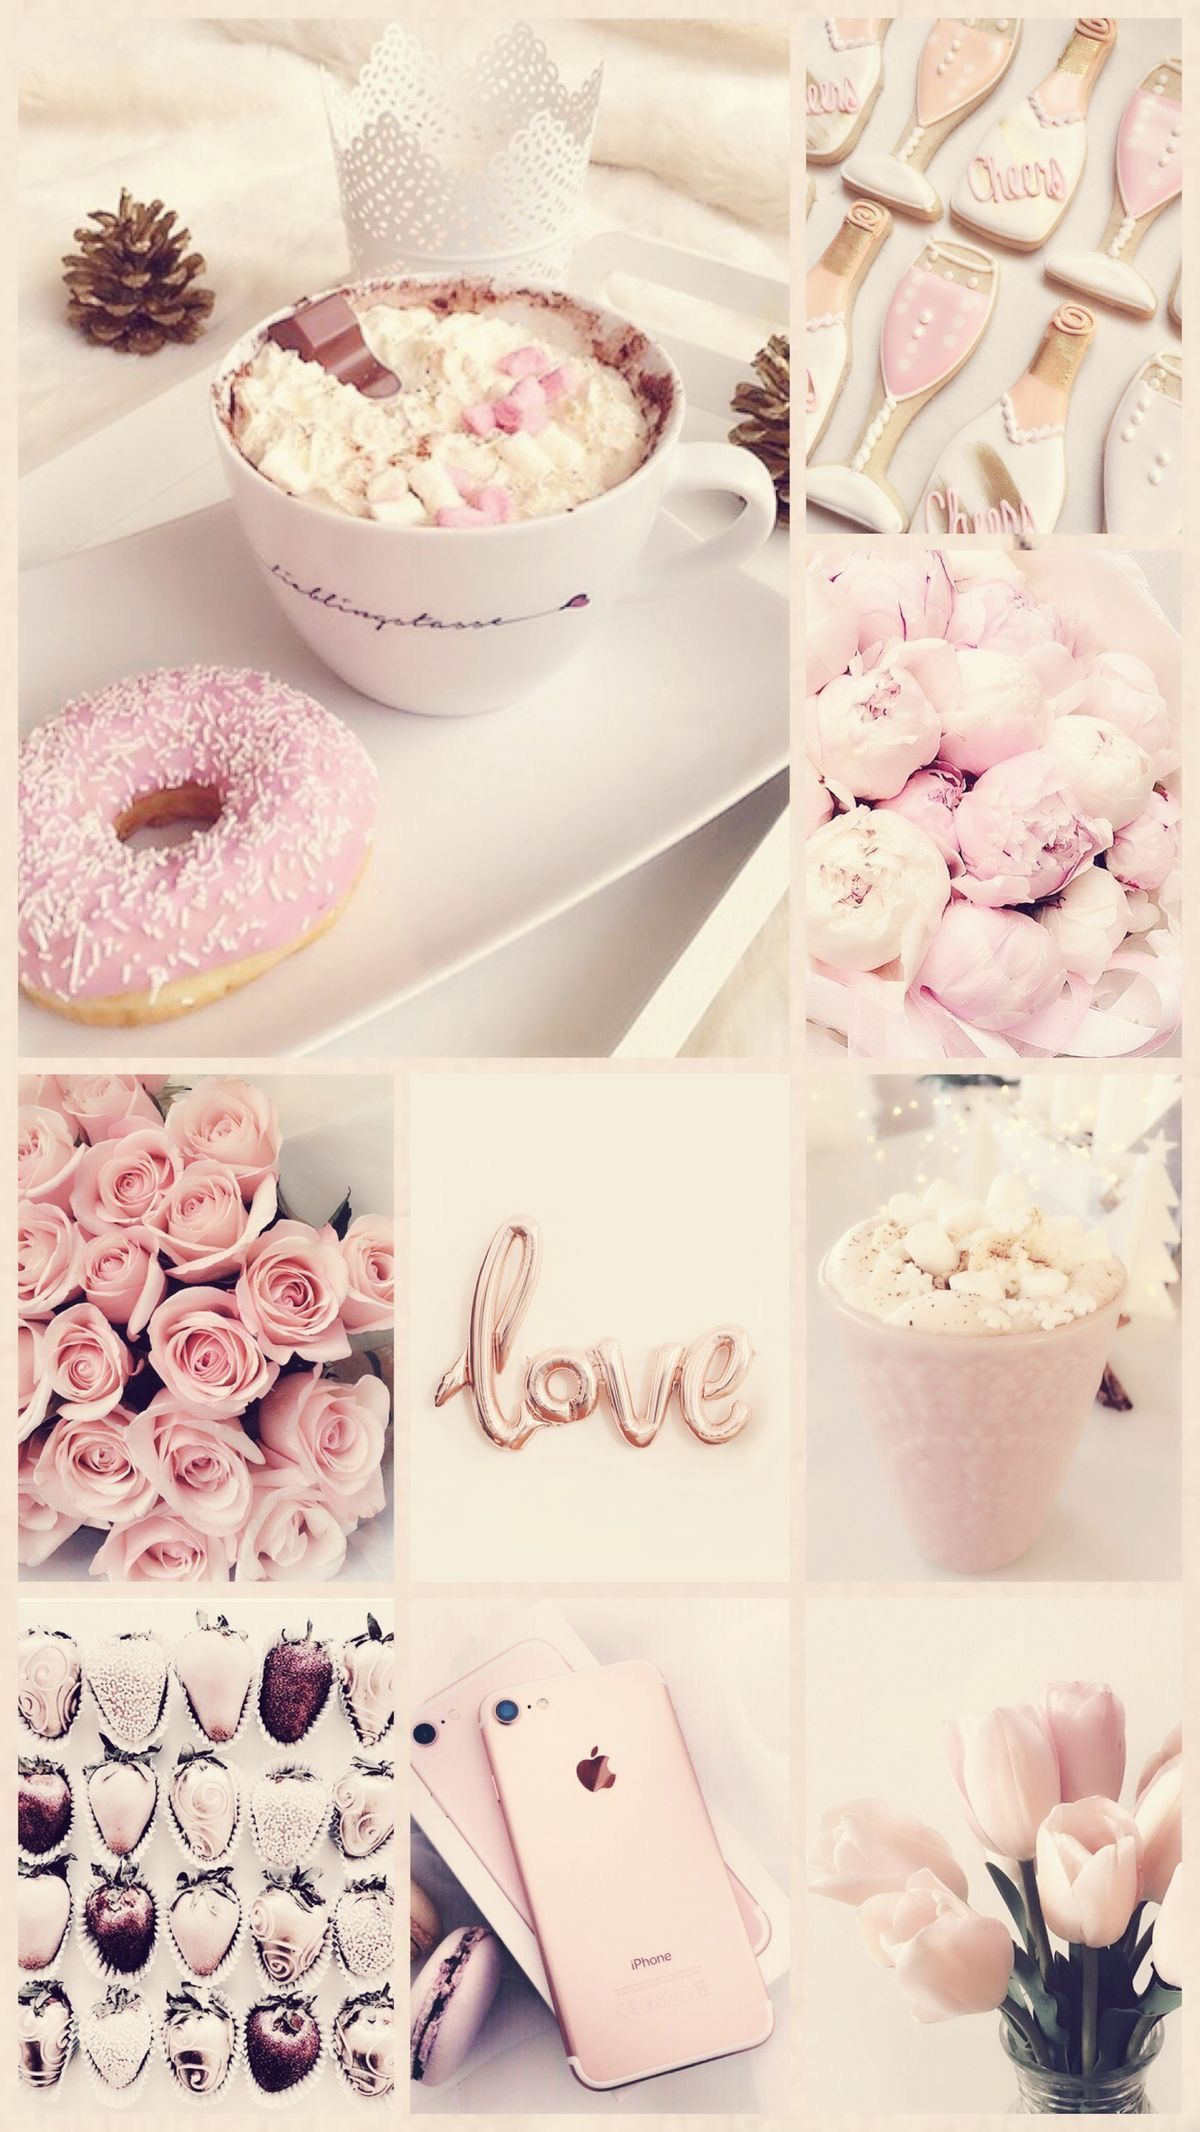 1920x1080 pink aesthetic desktop wallpaper tumblr>. 20+ Inspiration Pastel Aesthetic Rose Gold Cute Wallpapers ...